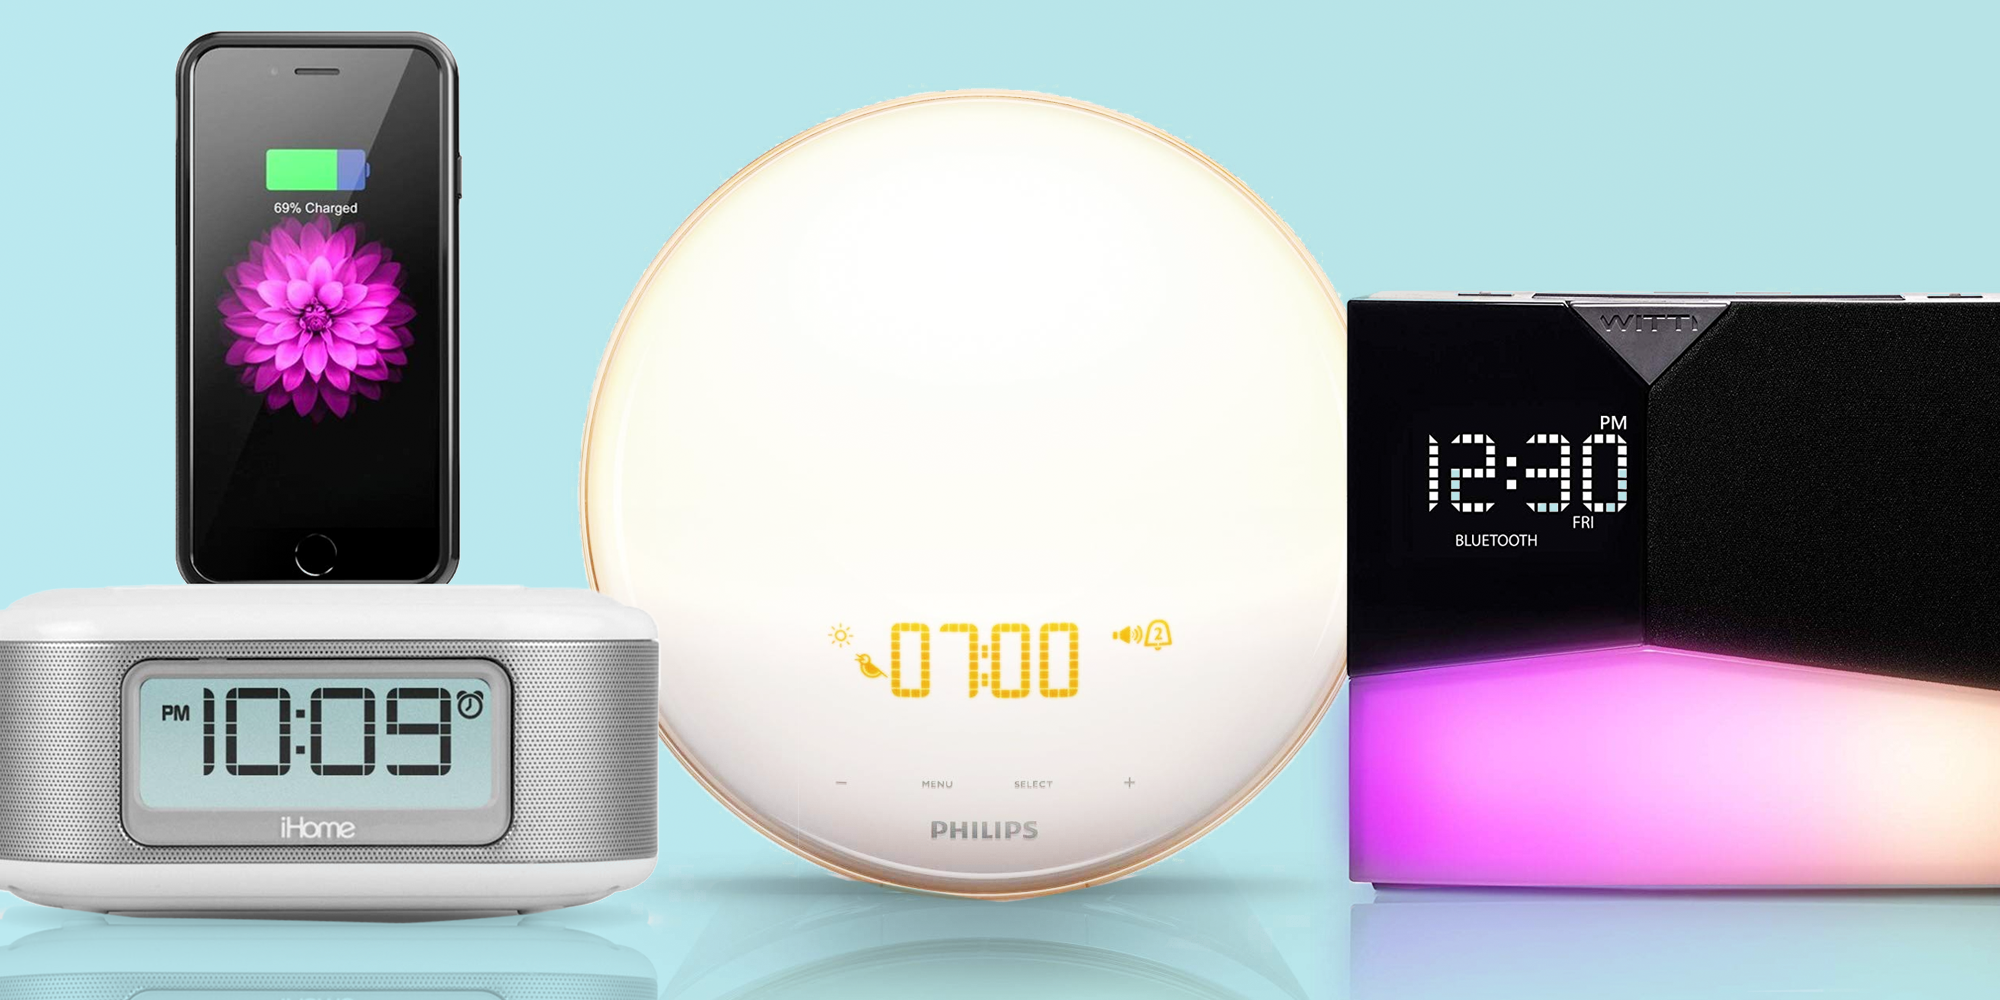 9 Best Alarm Clocks to Buy In 2019 - Top-Rated Alarm Clock